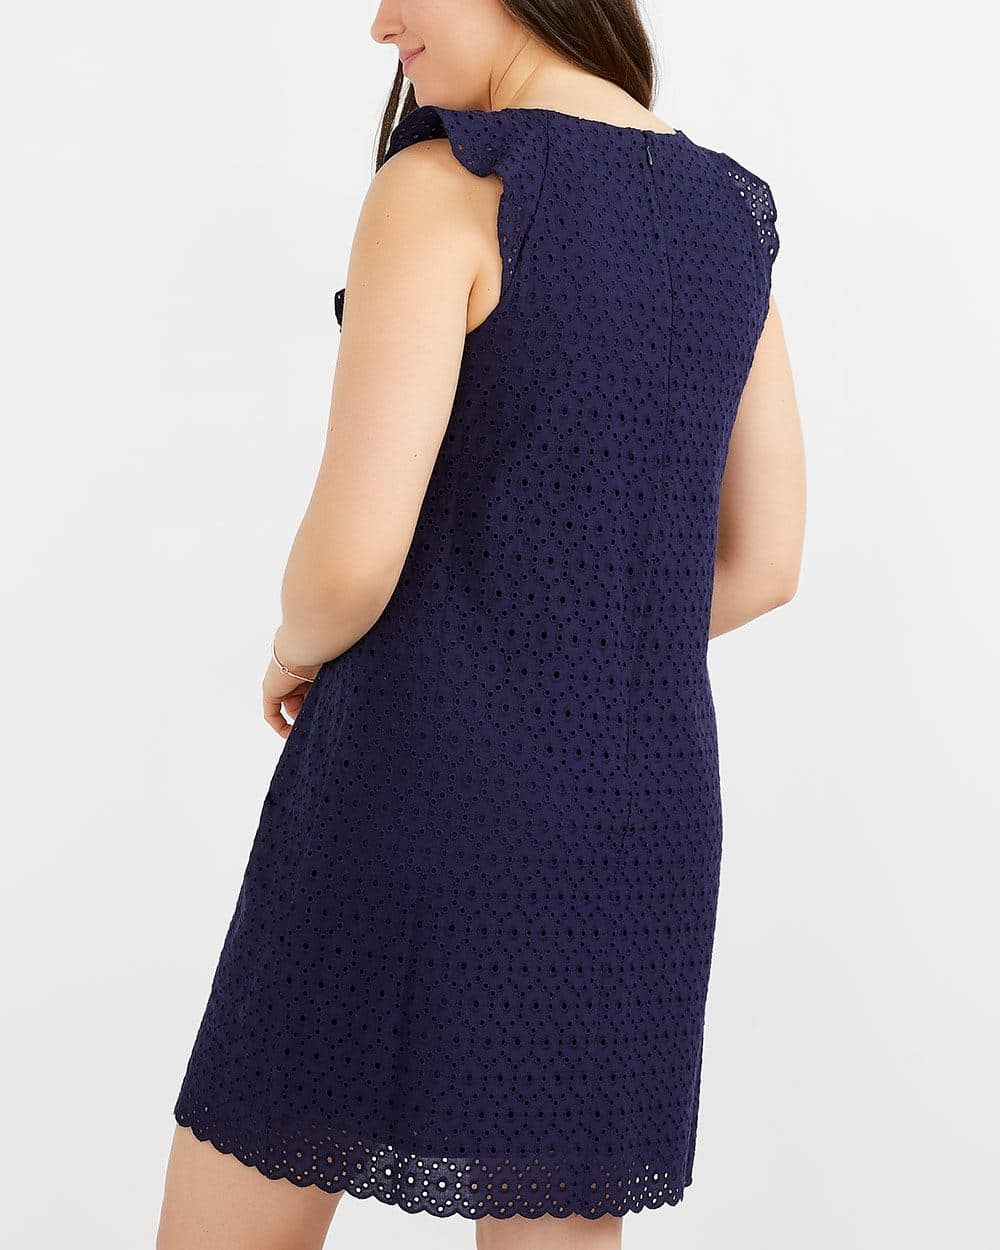 Eyelet Dress with Ruffles at Shoulders